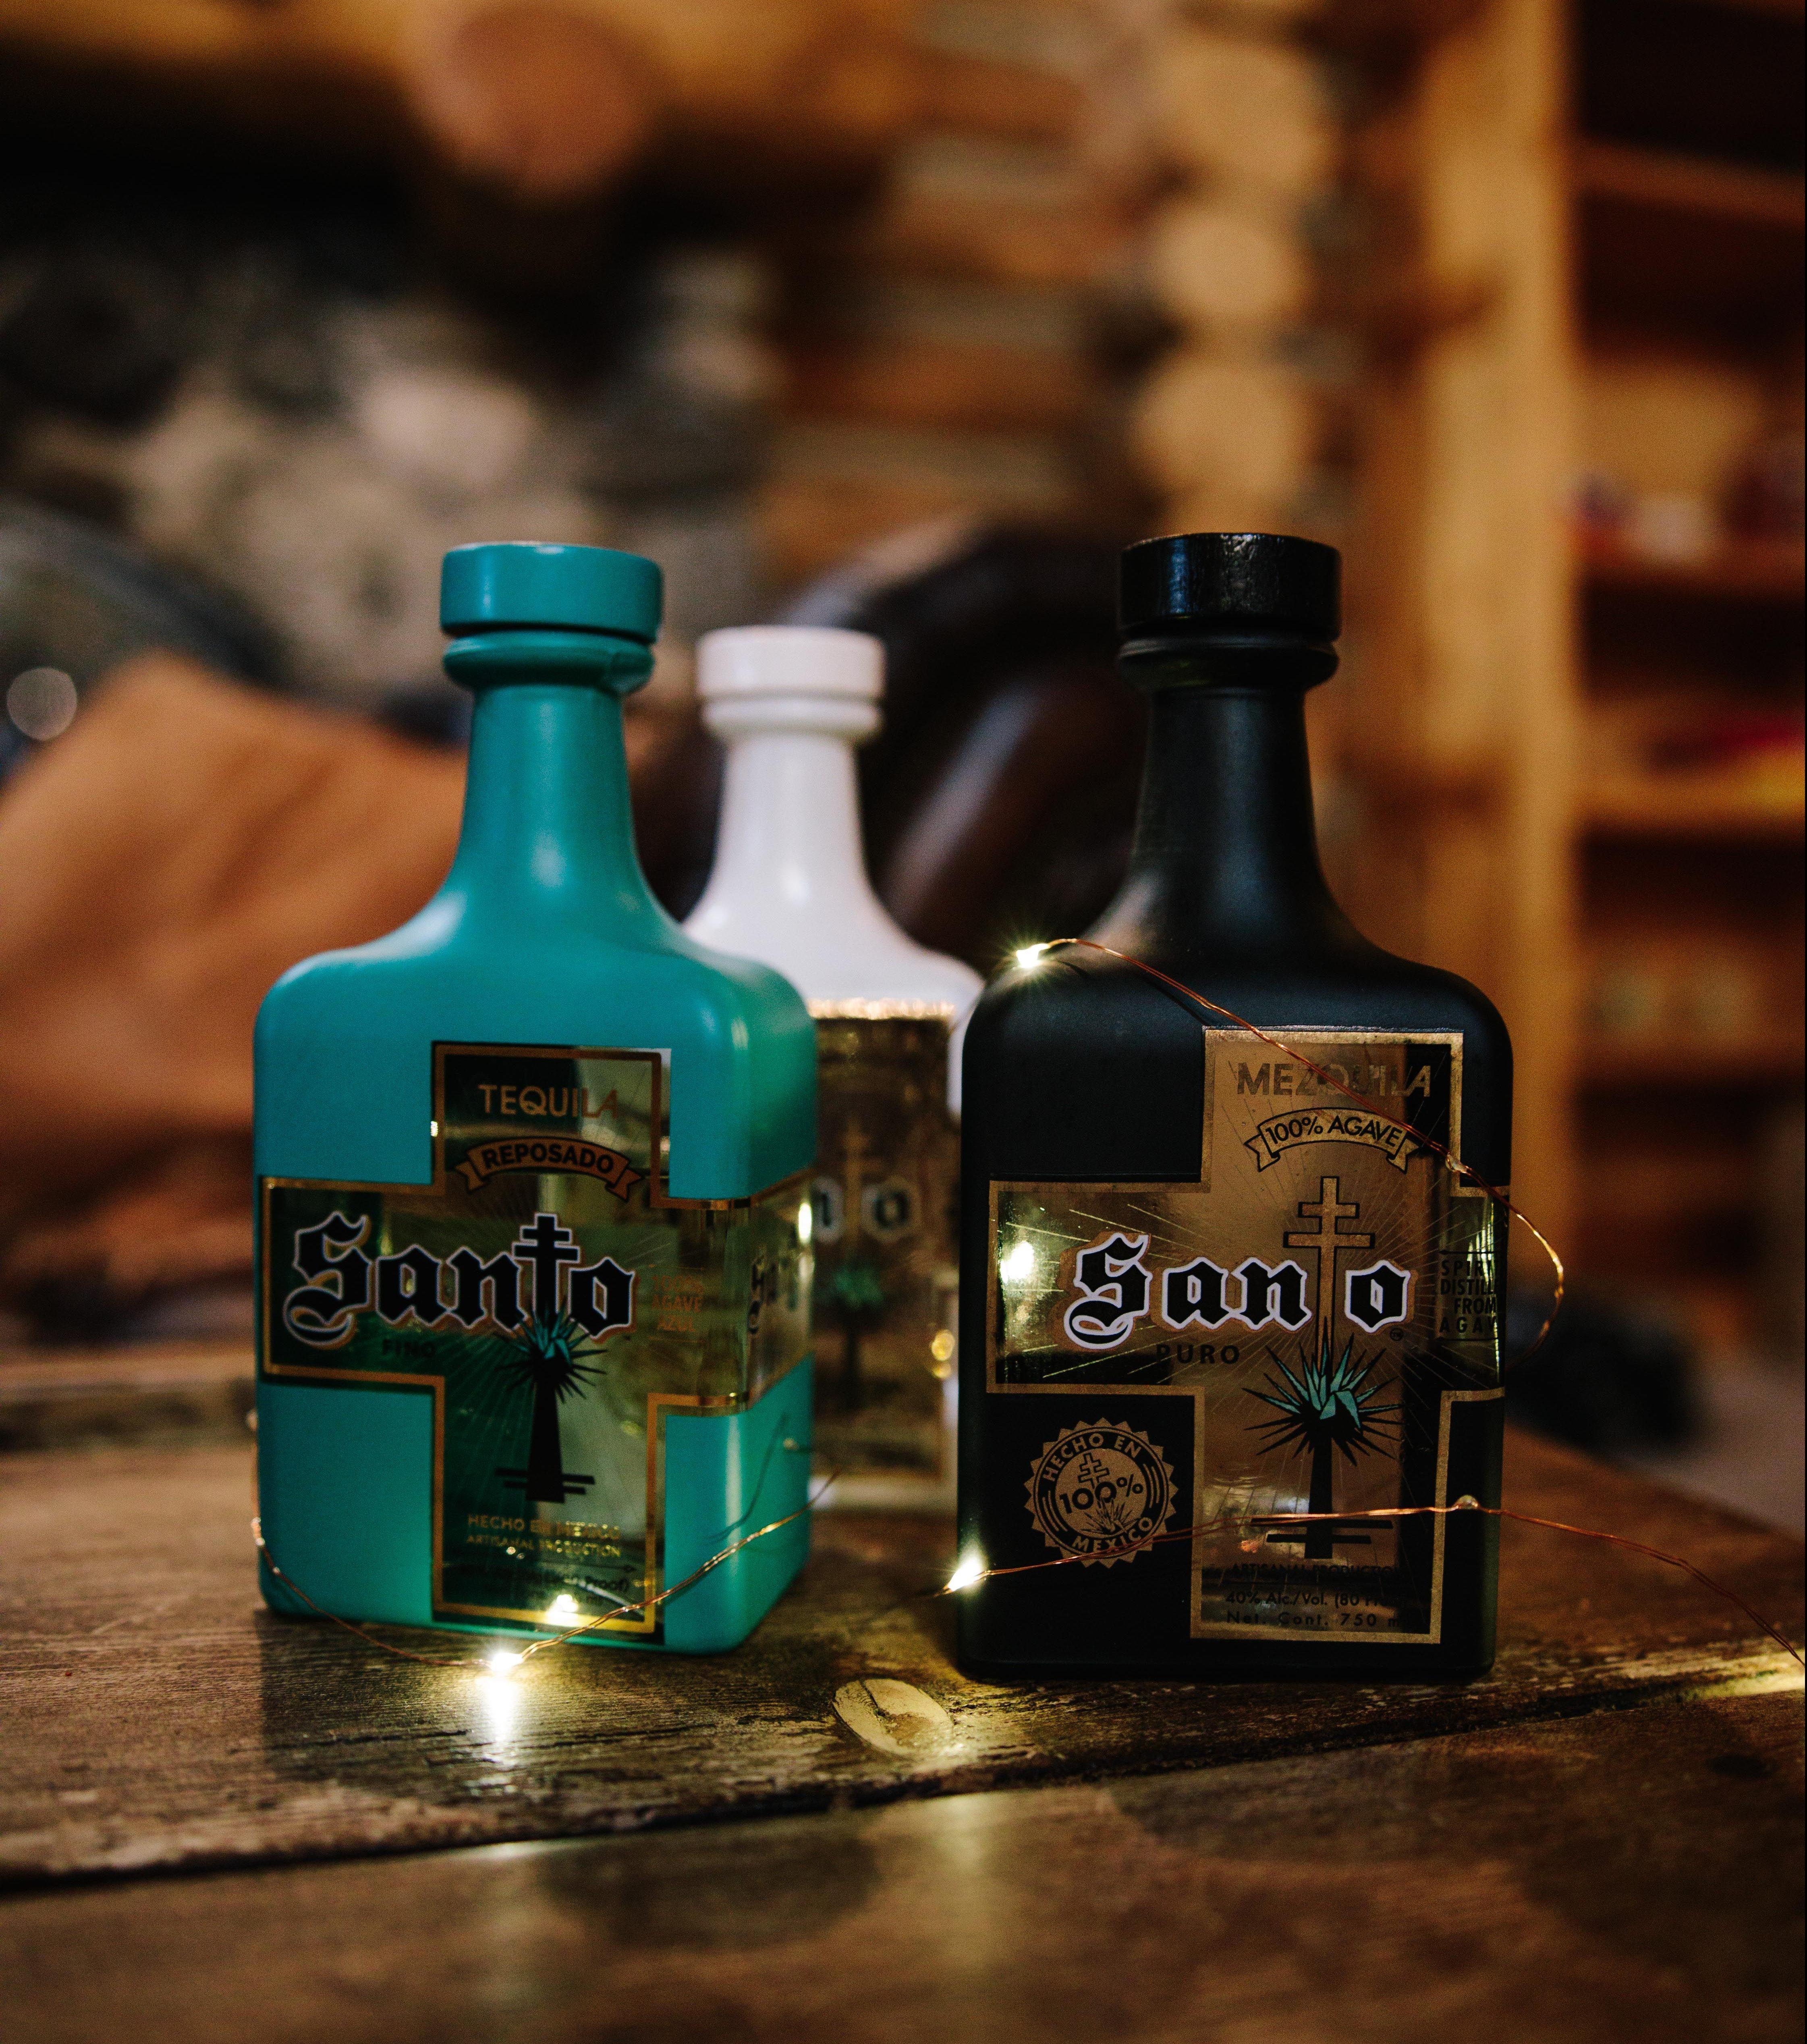 Santo tequila bottles